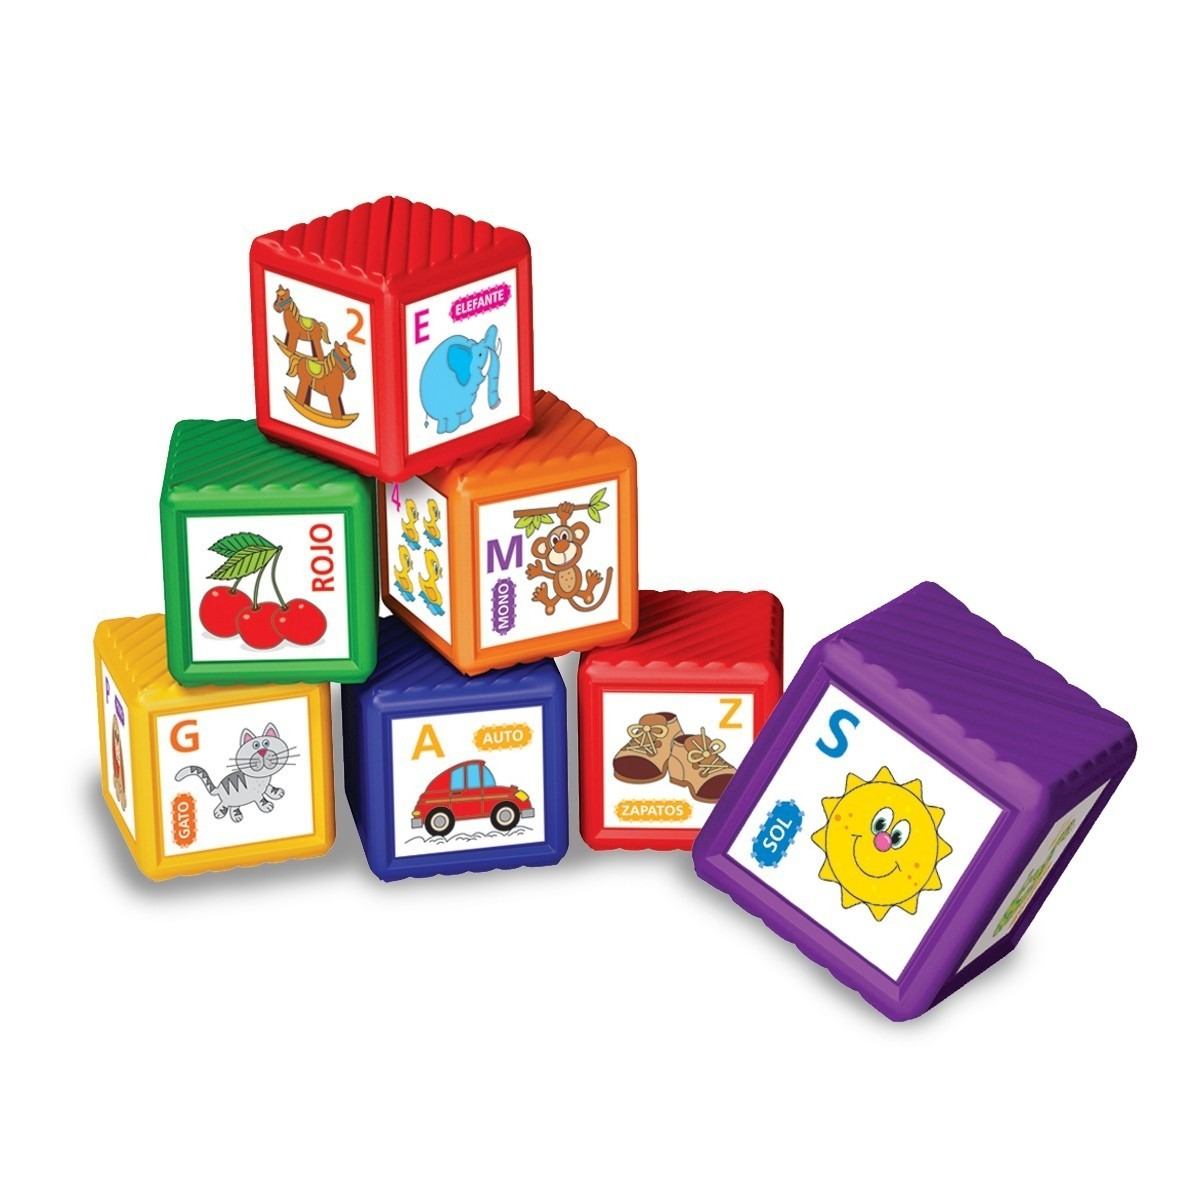 Cubos Apilables Para Ni Os En Mercado Libre Argentina # Muebles Didacticos Para Ninos